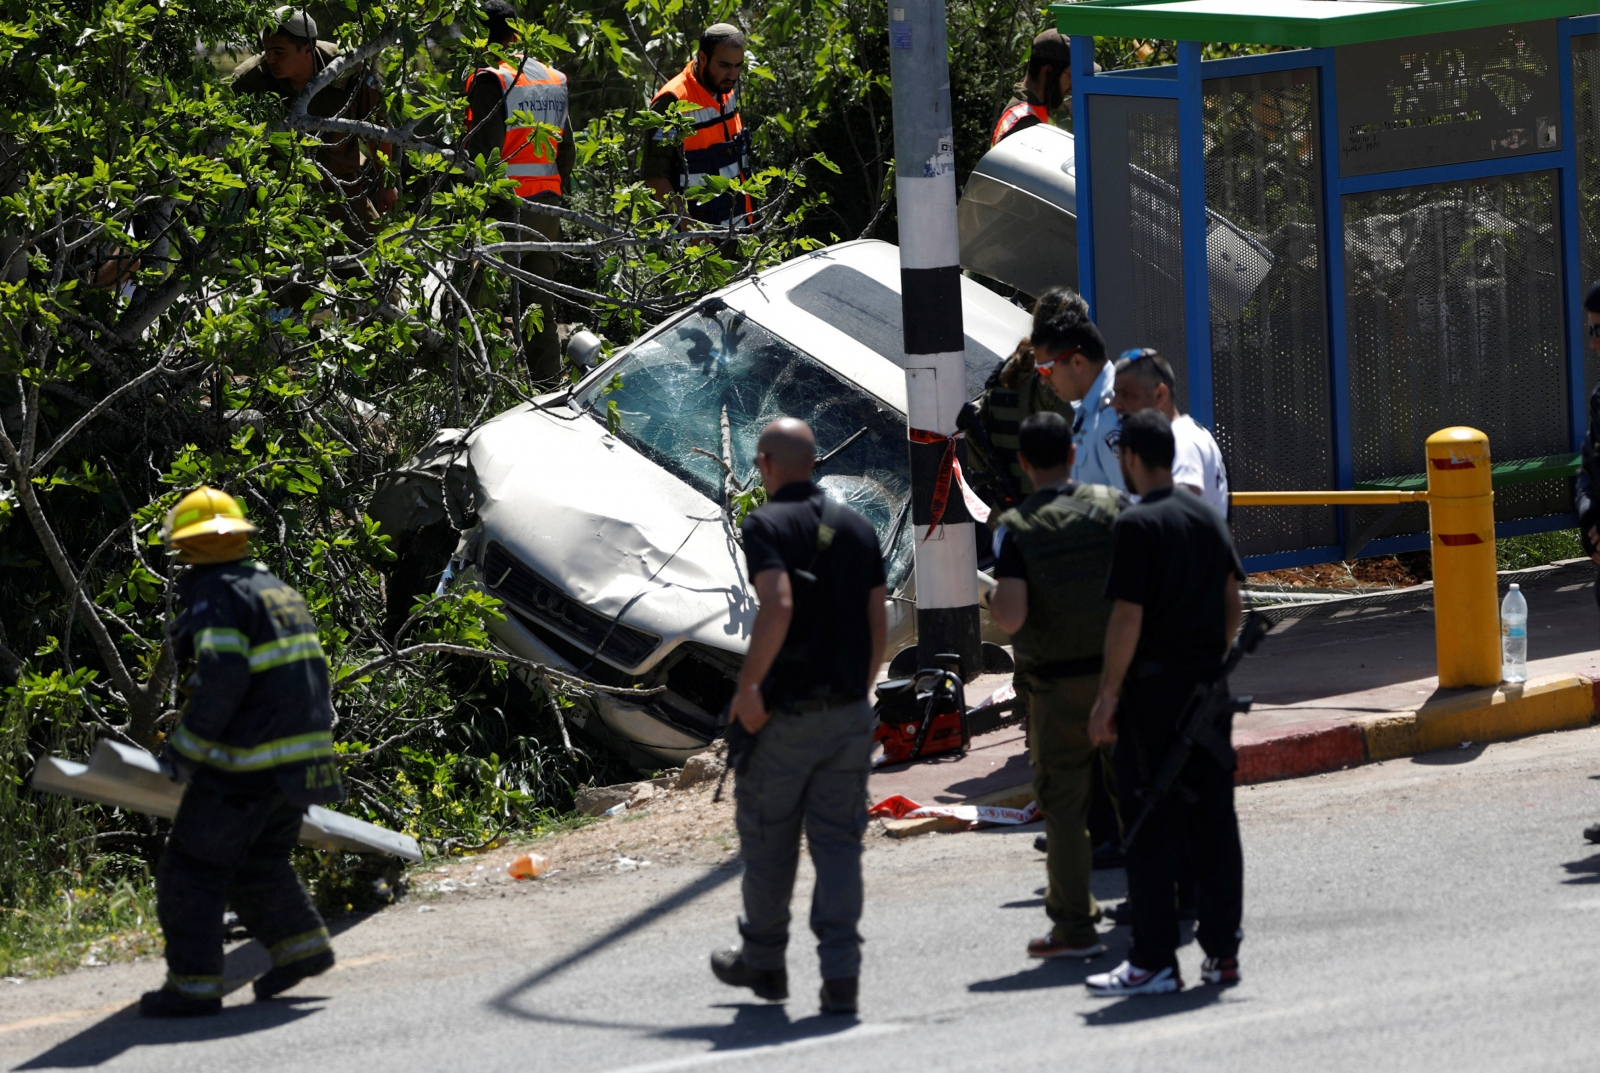 Israel West Bank car attack